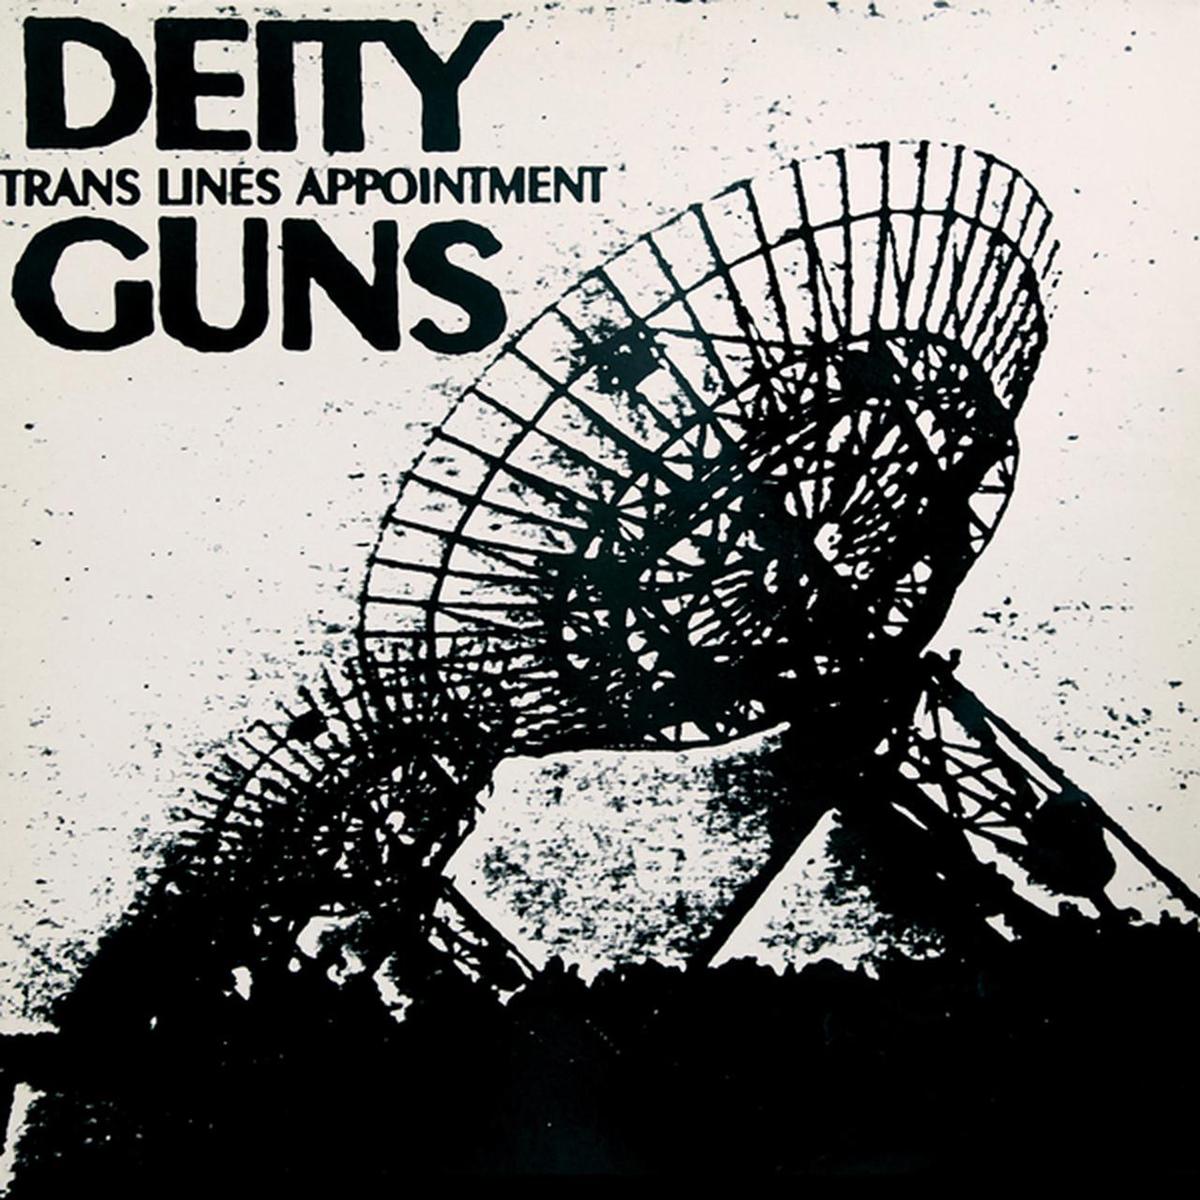 Deity Guns Guns. Trans Lines Appointment (LP)